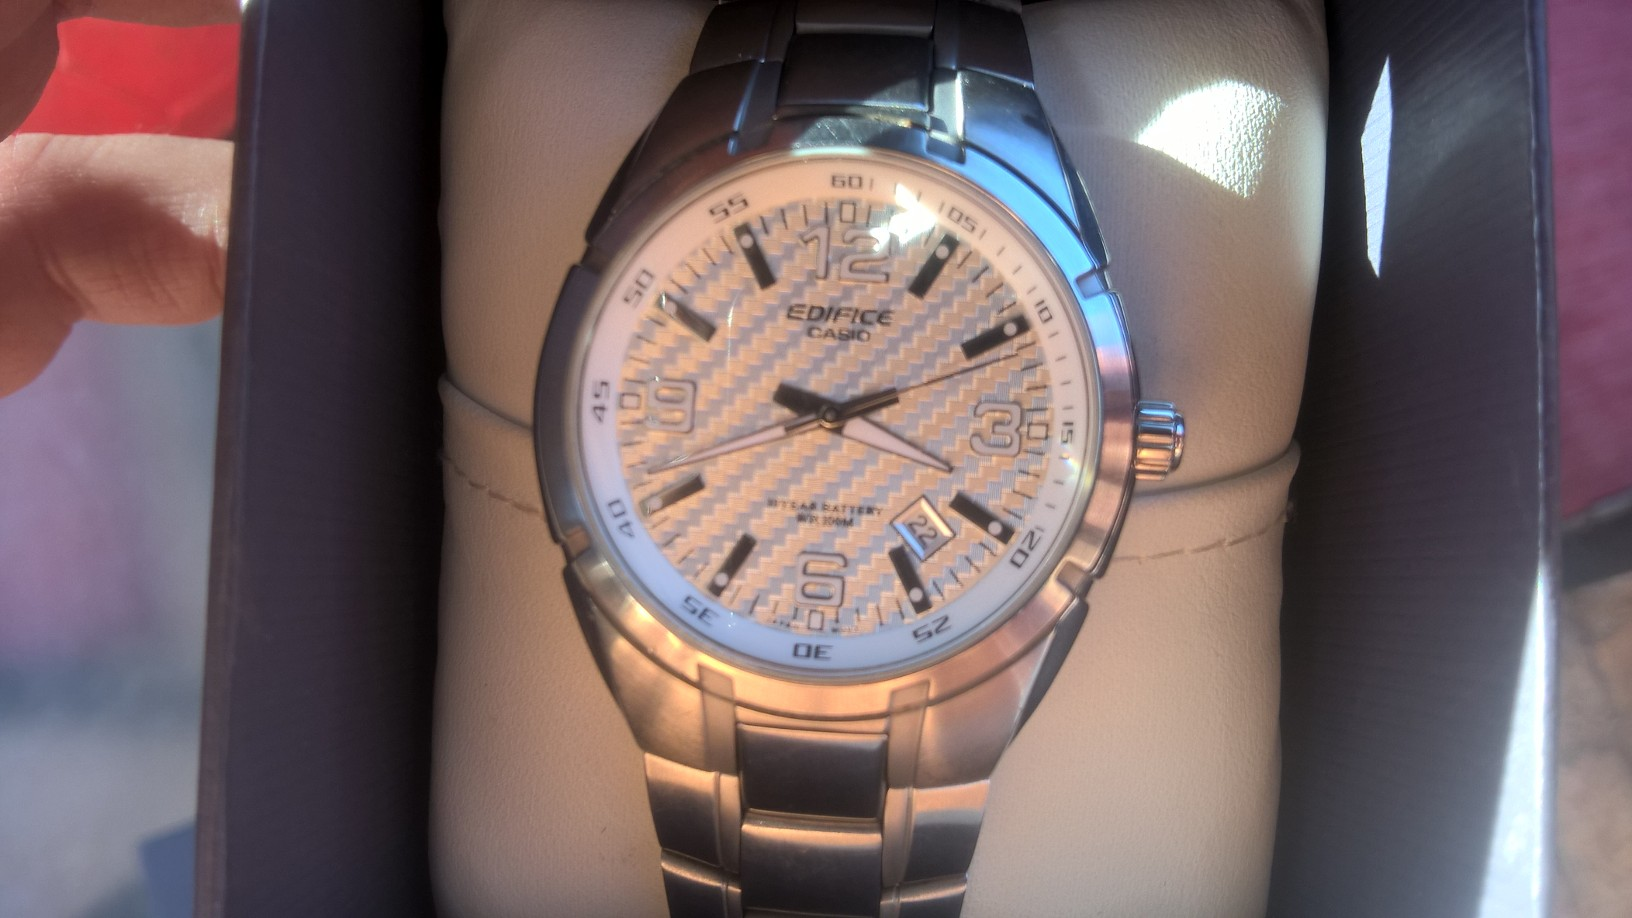 Casio Ediface watch